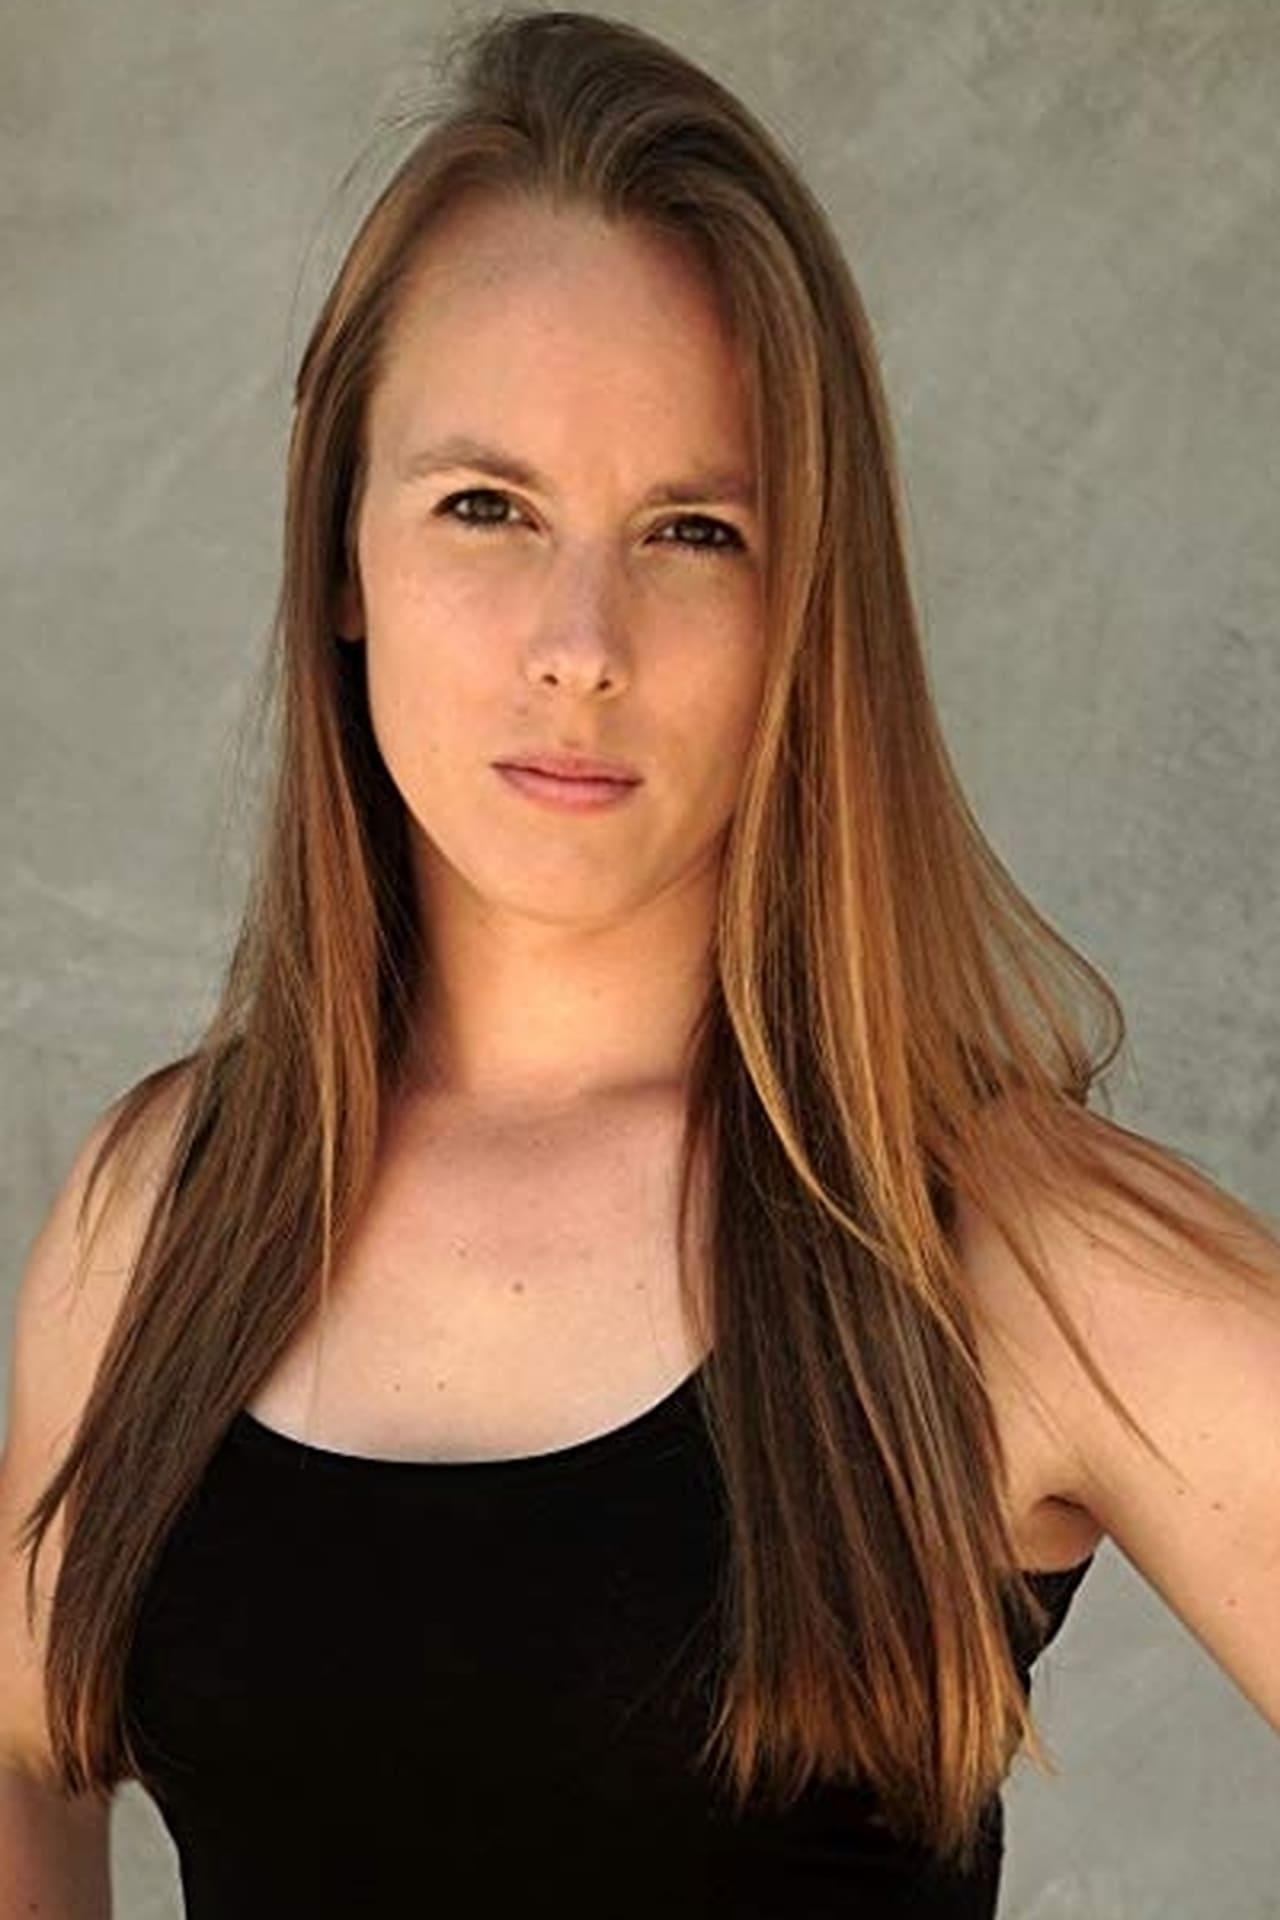 Amy Sturdivant isKesha